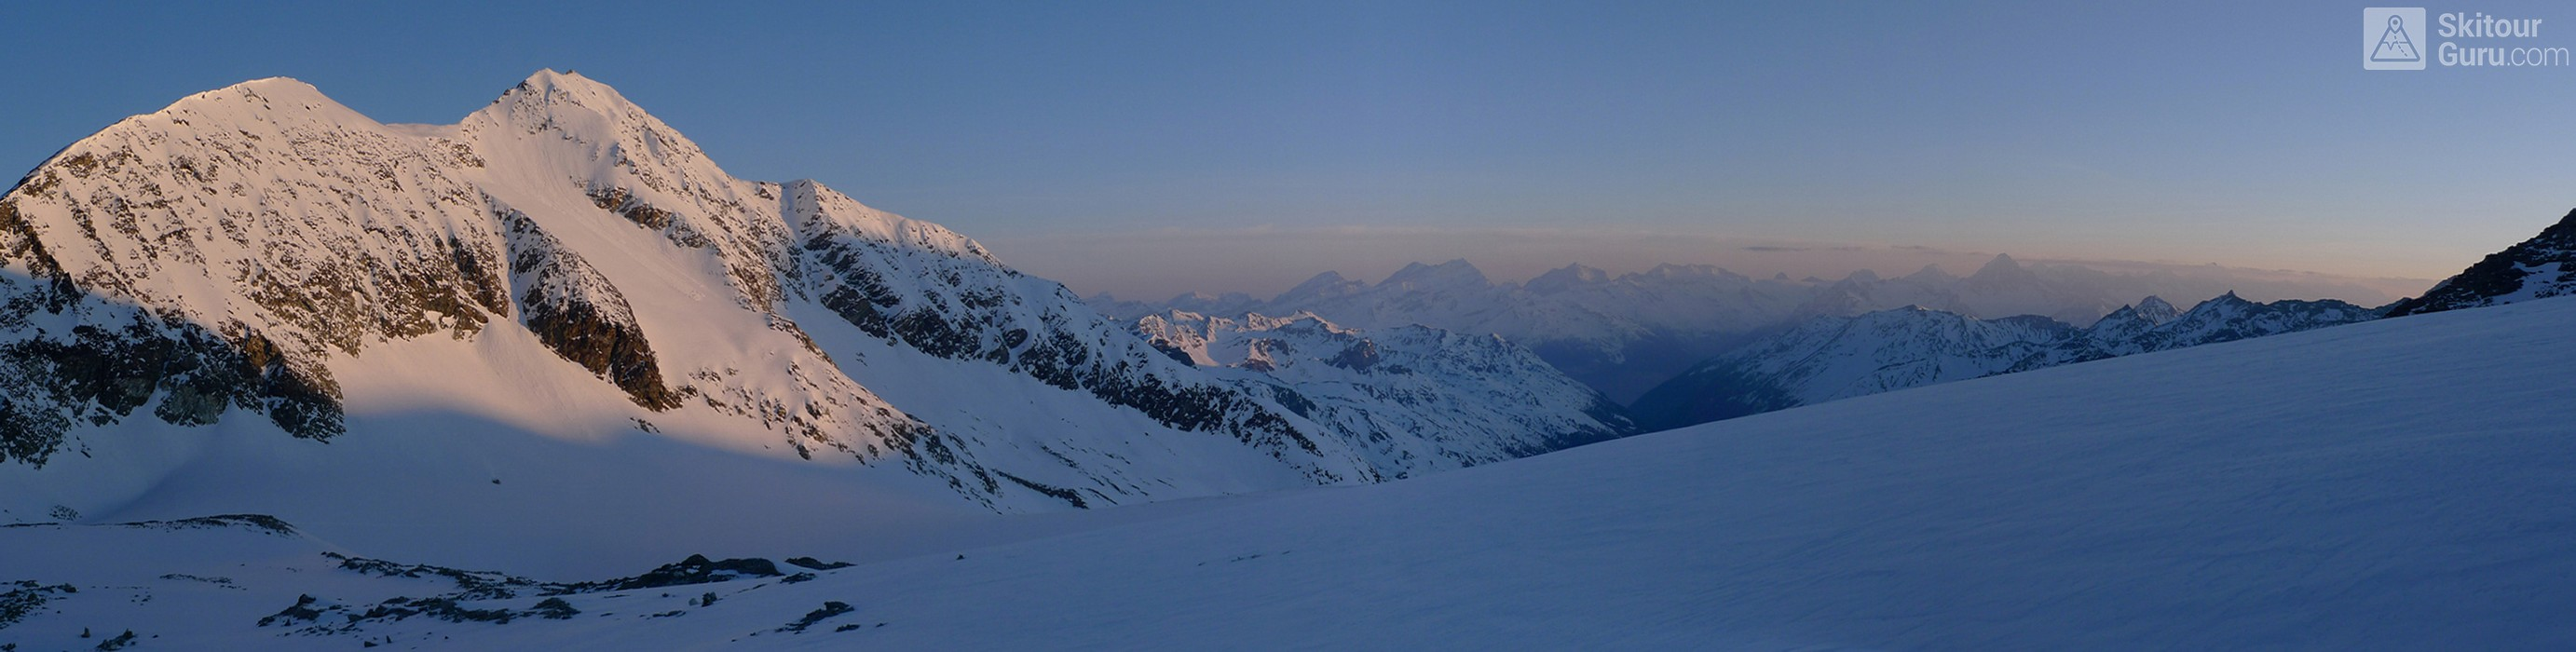 Cabane Tracuit Walliser Alpen / Alpes valaisannes Švýcarsko panorama 19